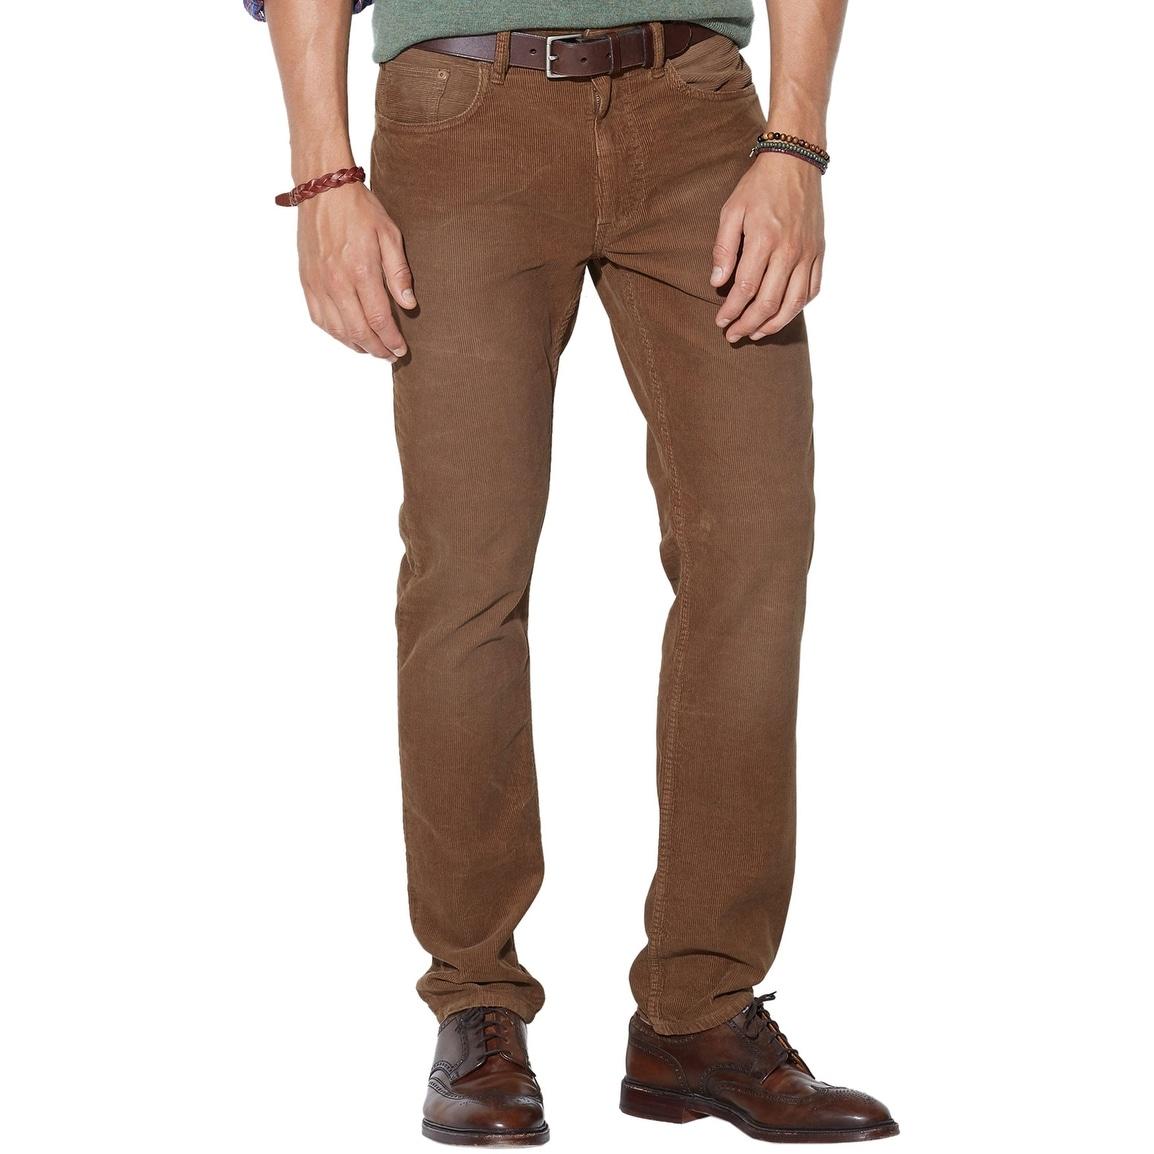 65904108 Polo Ralph Lauren Stretch Slim Fit Corduroy Pant